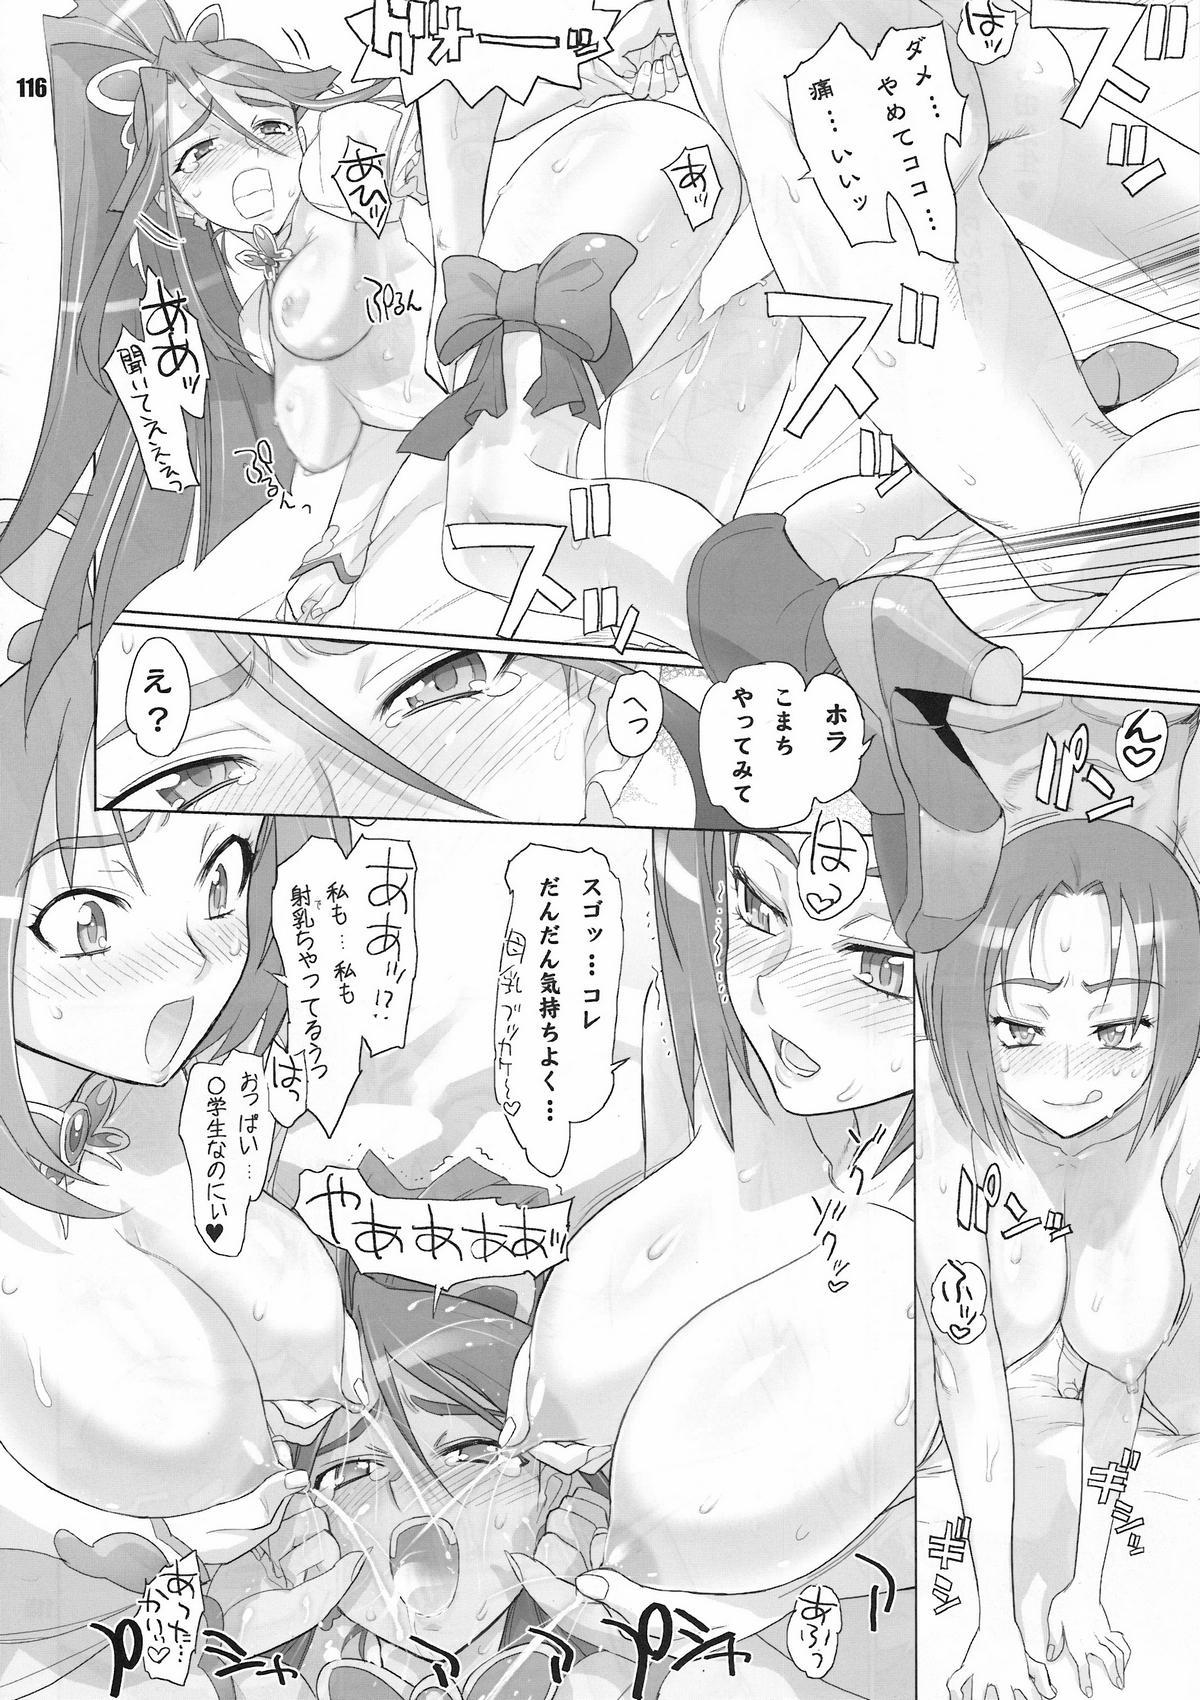 Inazuma Pretty Warrior 113